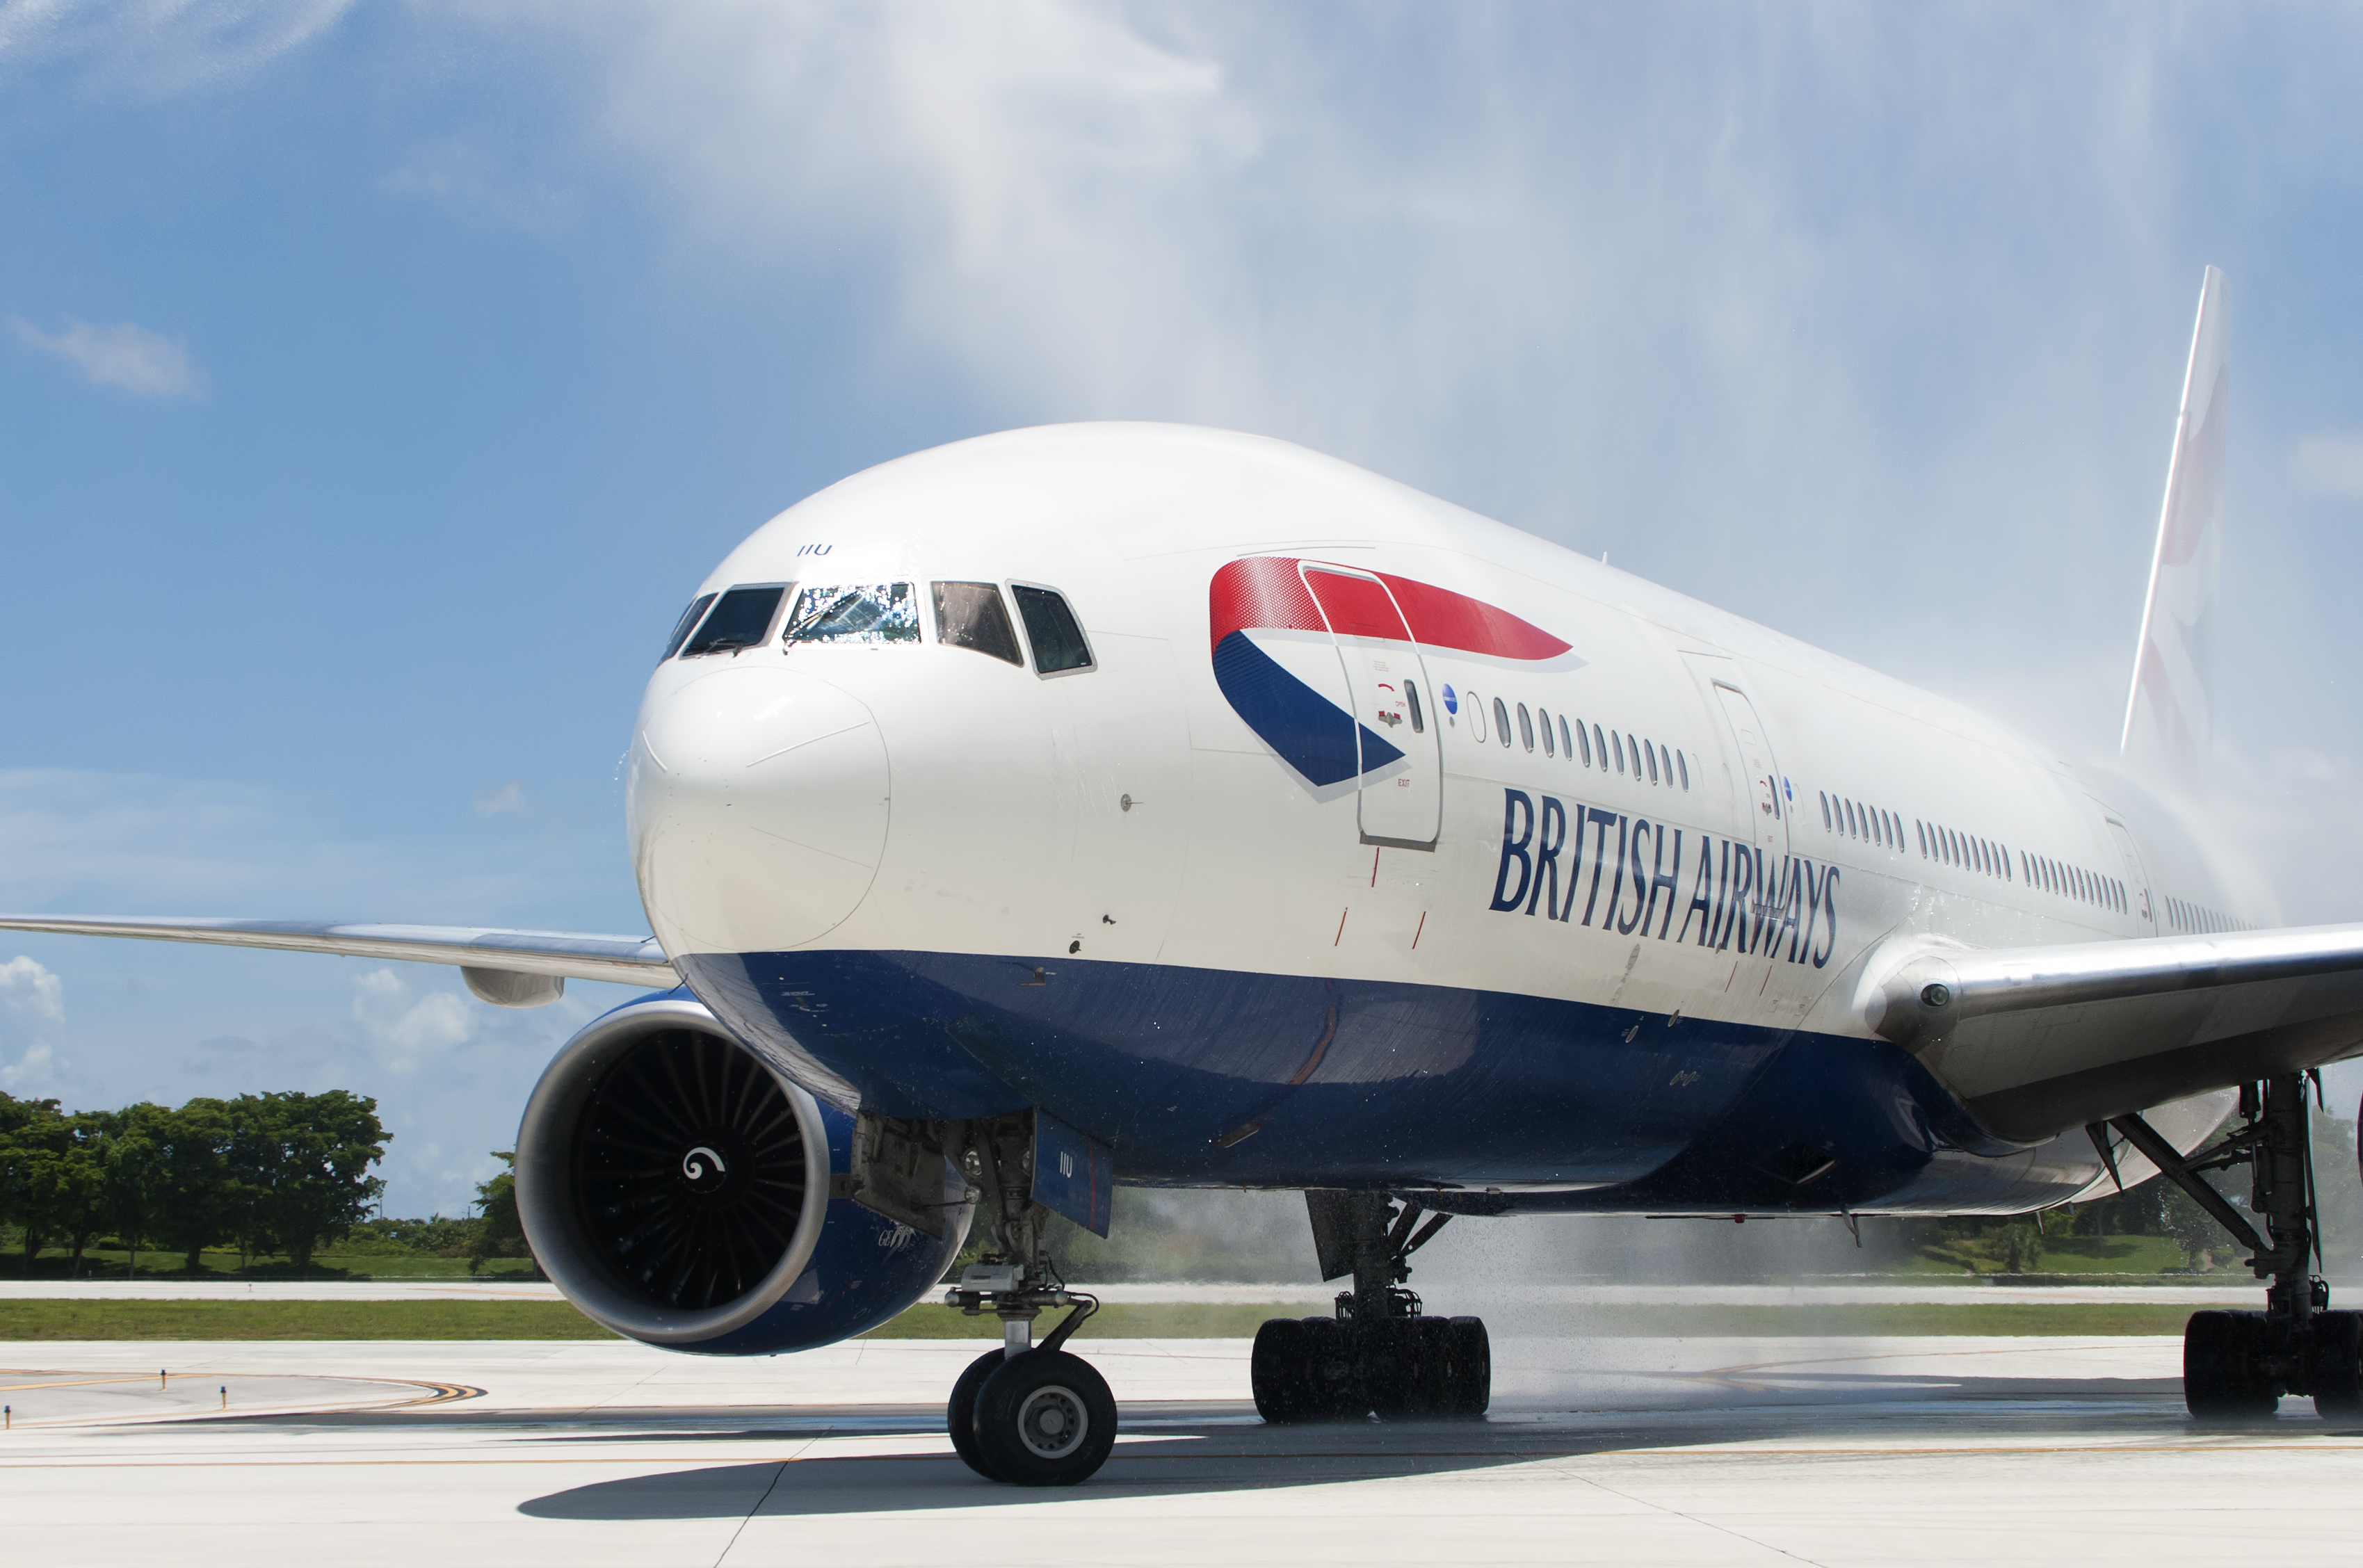 British Airways Arrives in Fort Lauderdale ...